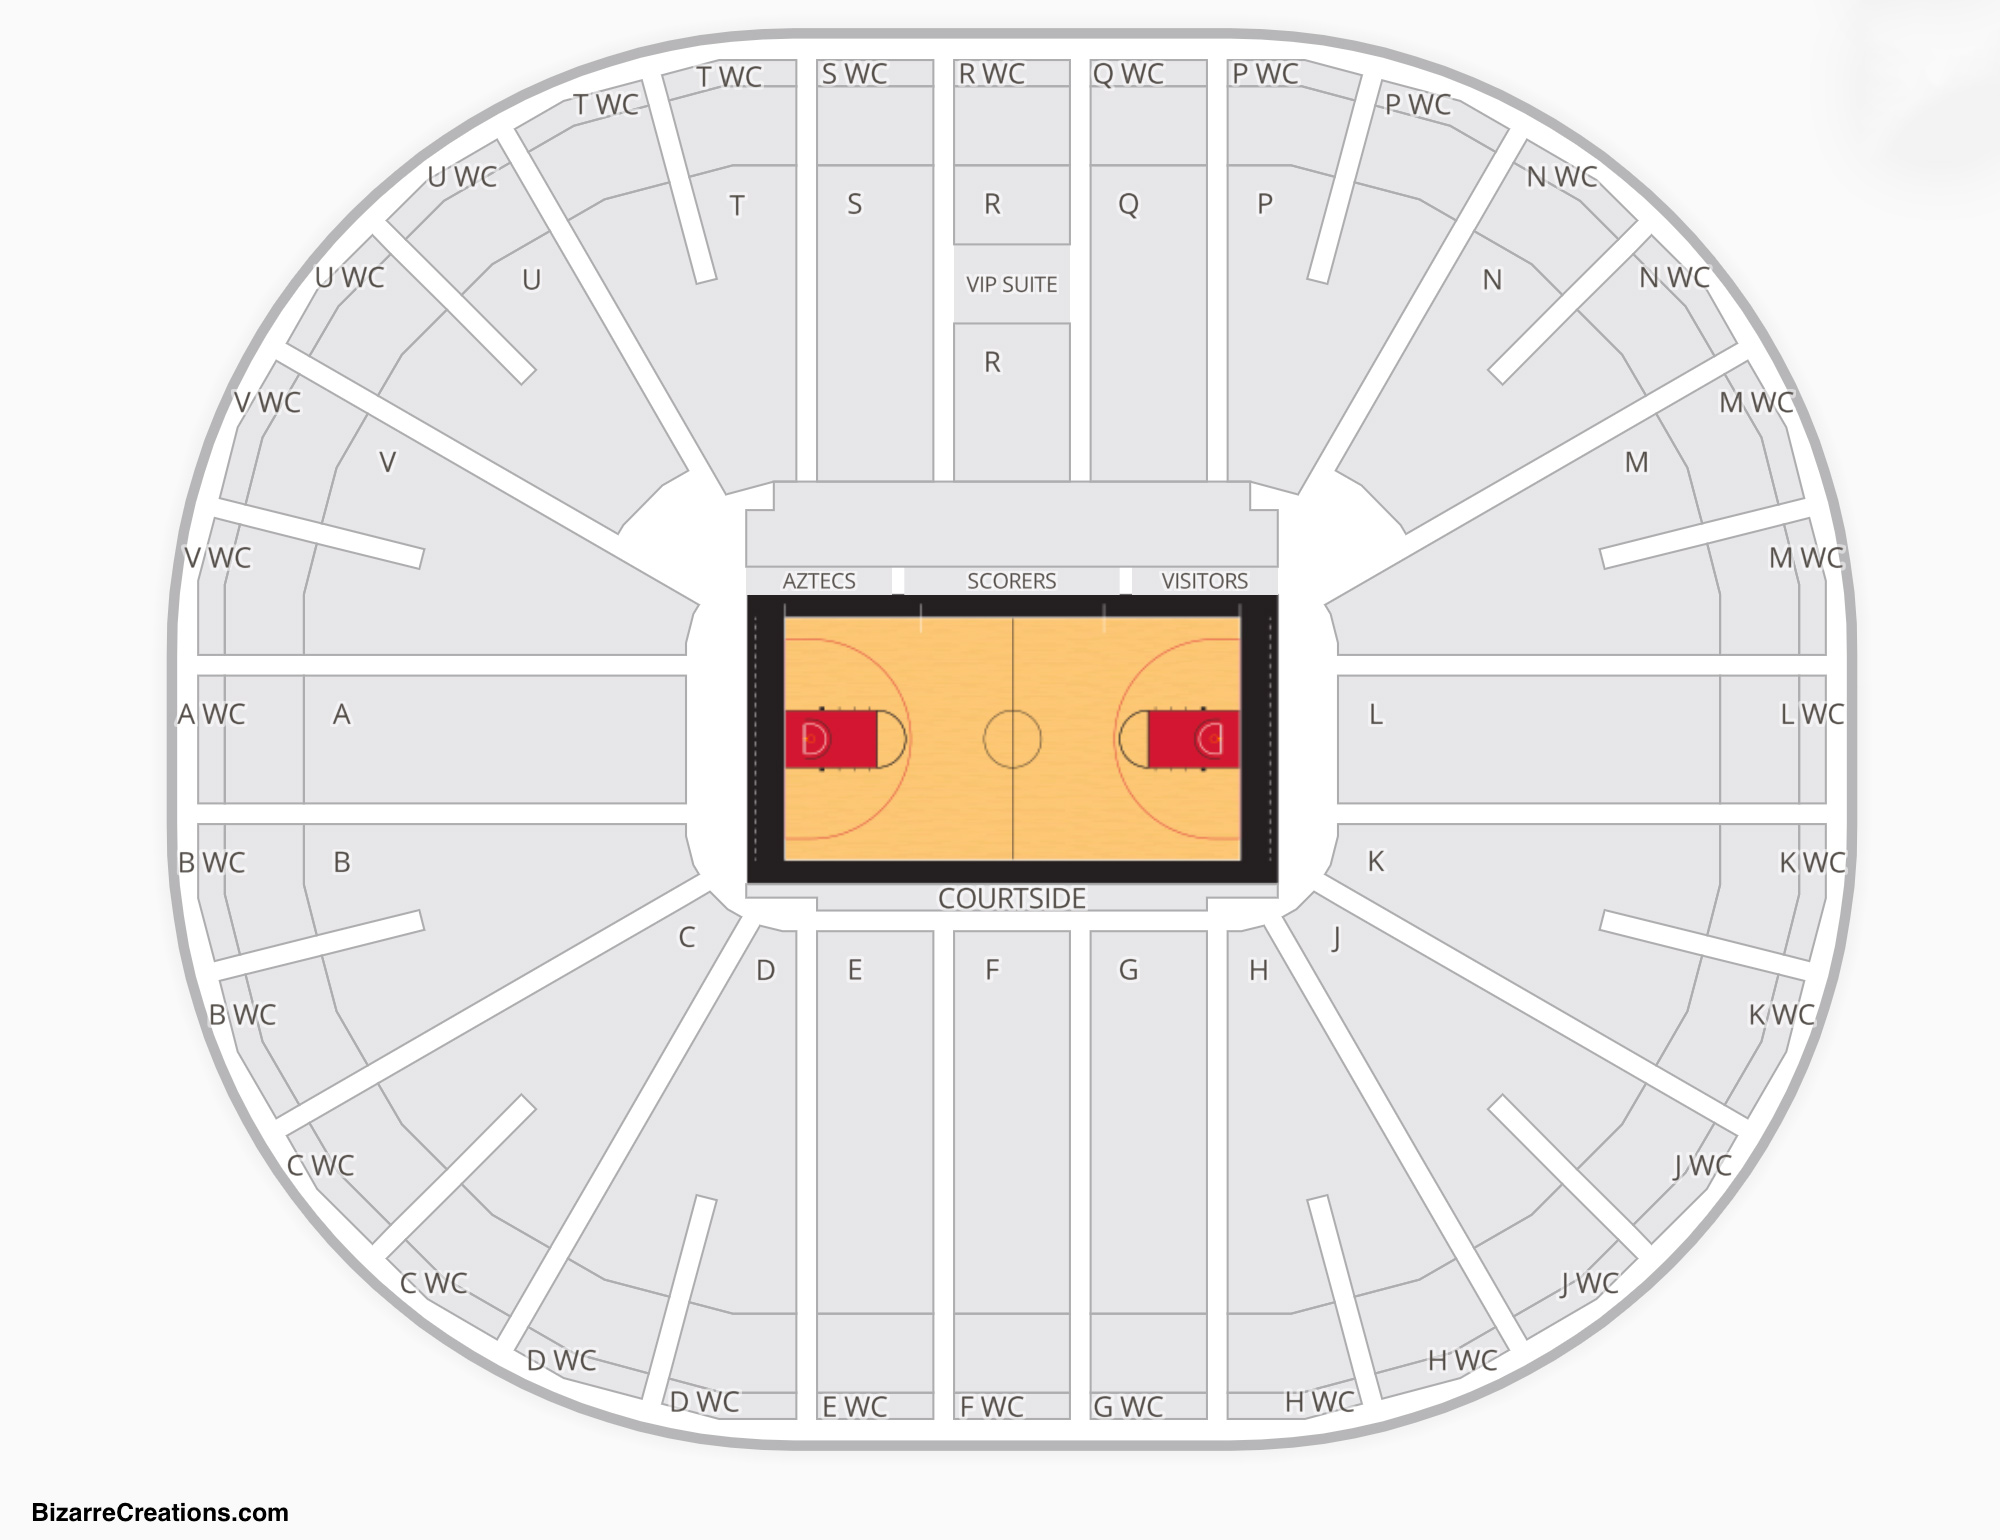 Viejas Arena Basketball Seating Chart